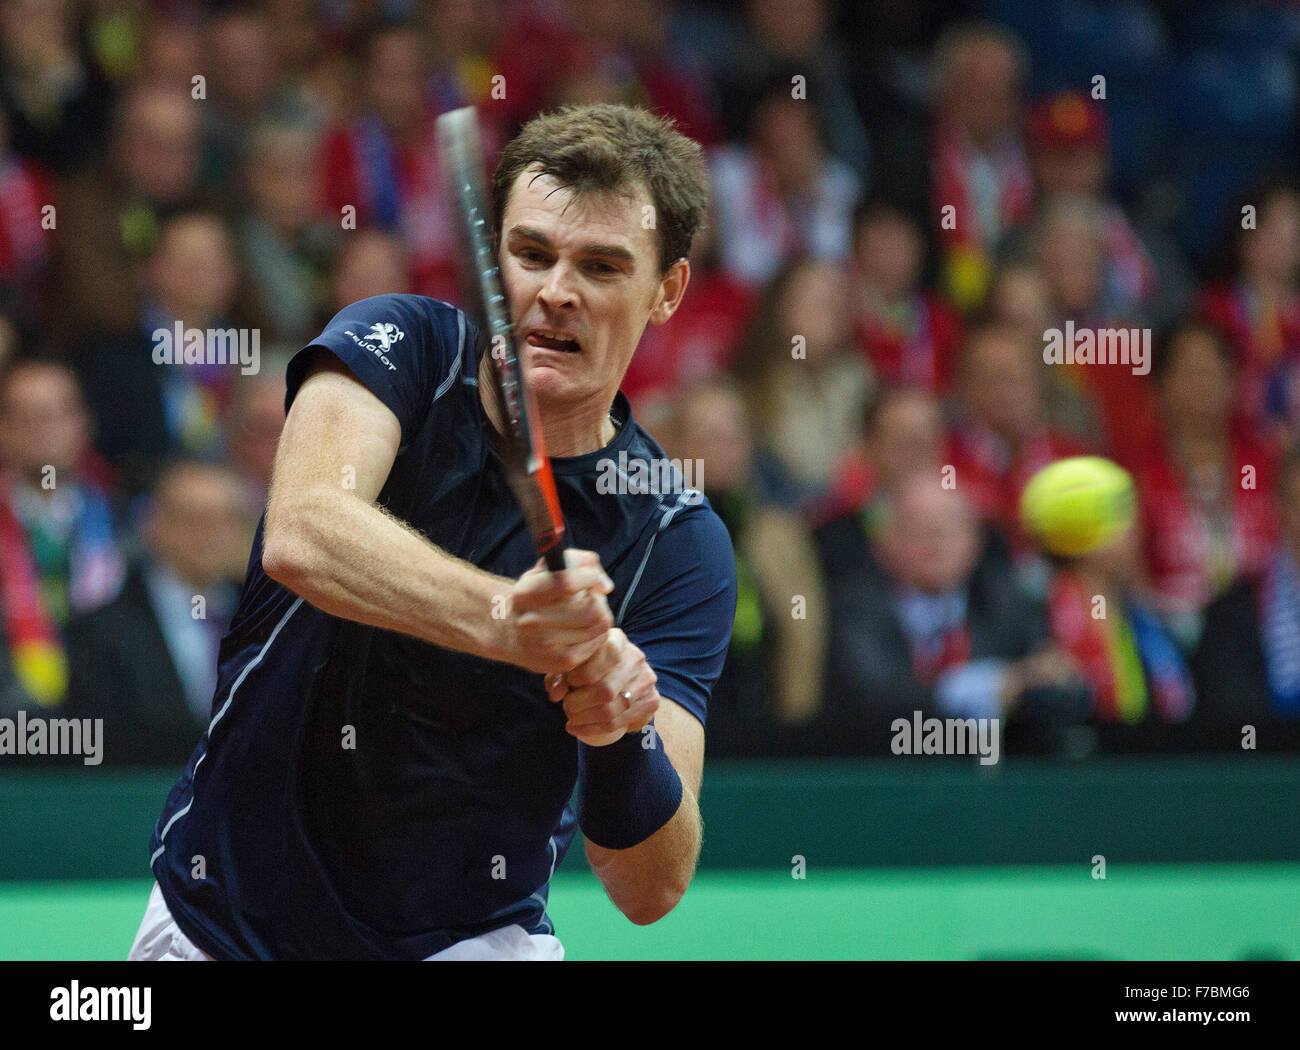 Gent, Belgium, November 28, 2015, Davis Cup Final, Belgium-Great Britain, day two, doubles match, Jamie Murray (GBR) - Stock Image